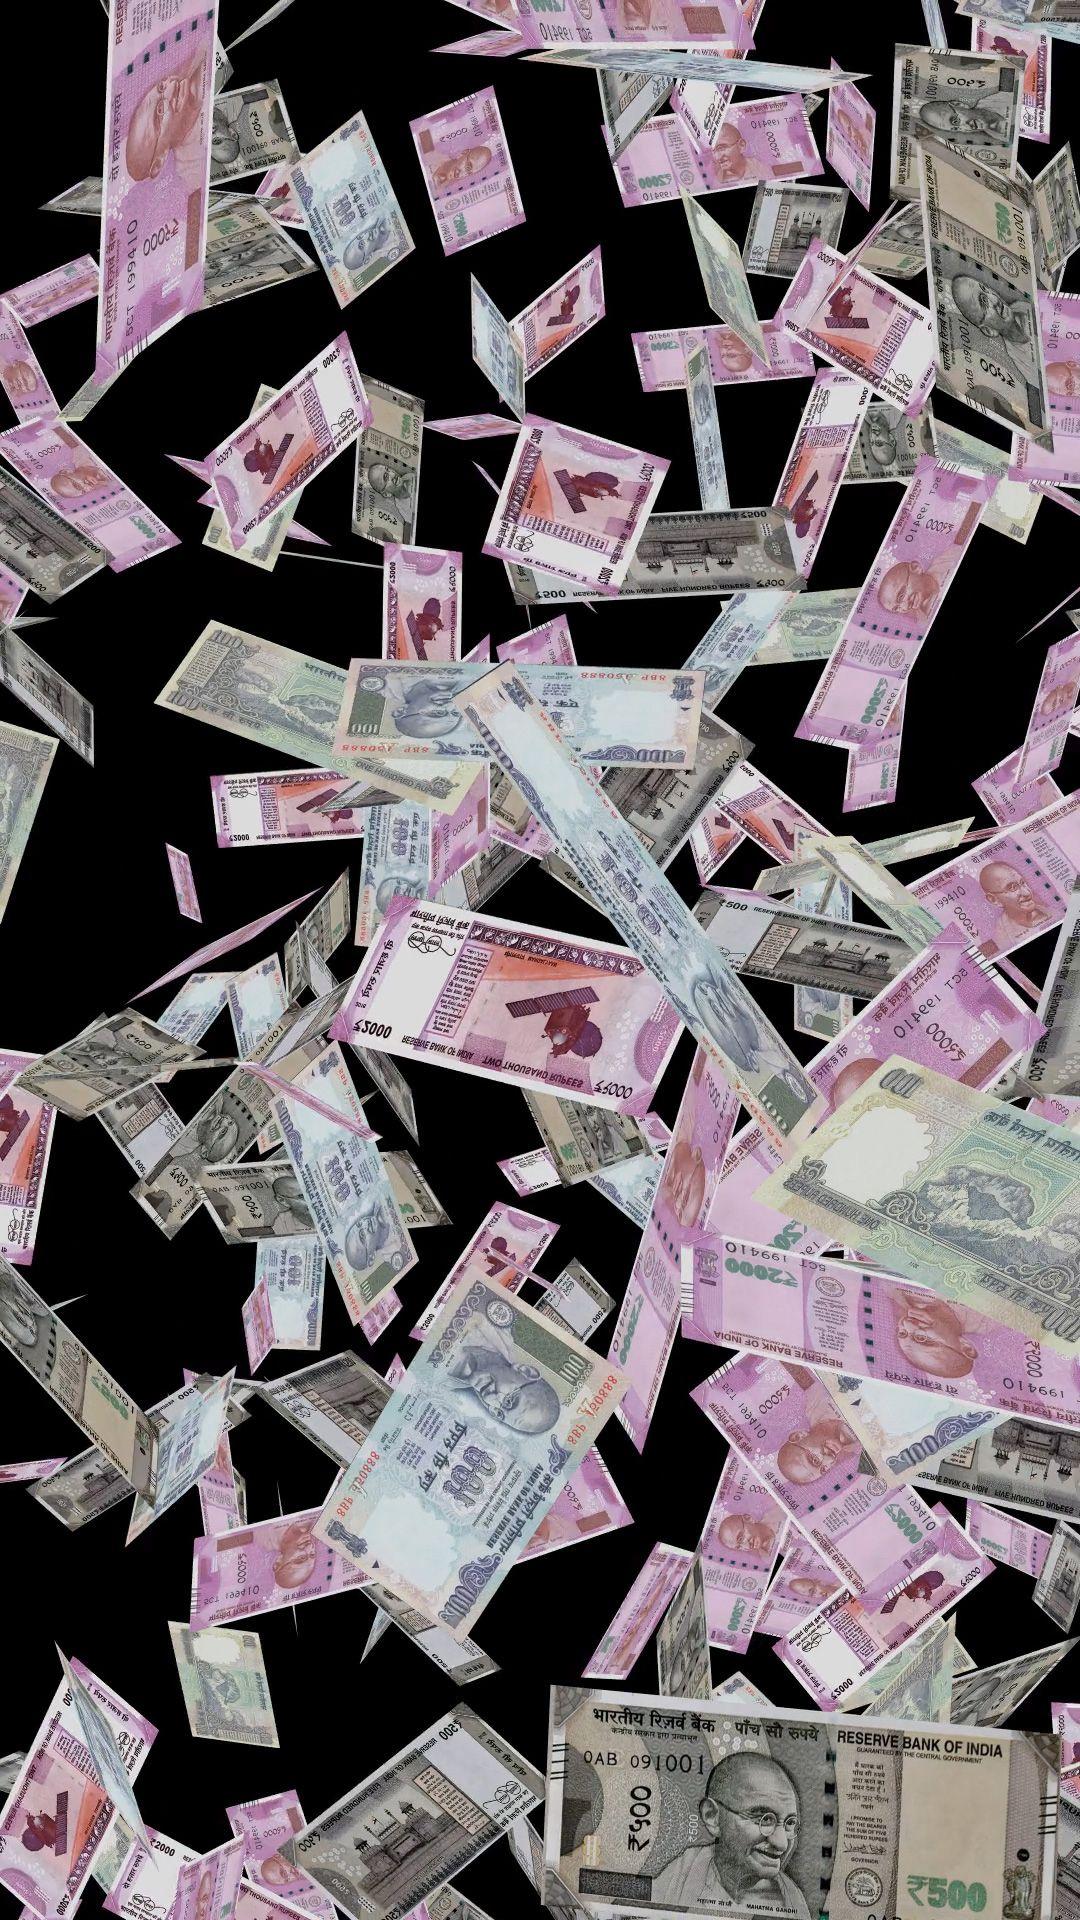 Nails Ngmoney Fallingmoney Indian Indianrupees Raa Newindiancurrency Money Moneylove Moneyaffirmations Allabou Diwali Wallpaper Wallpaper Stencil Shiva Photos